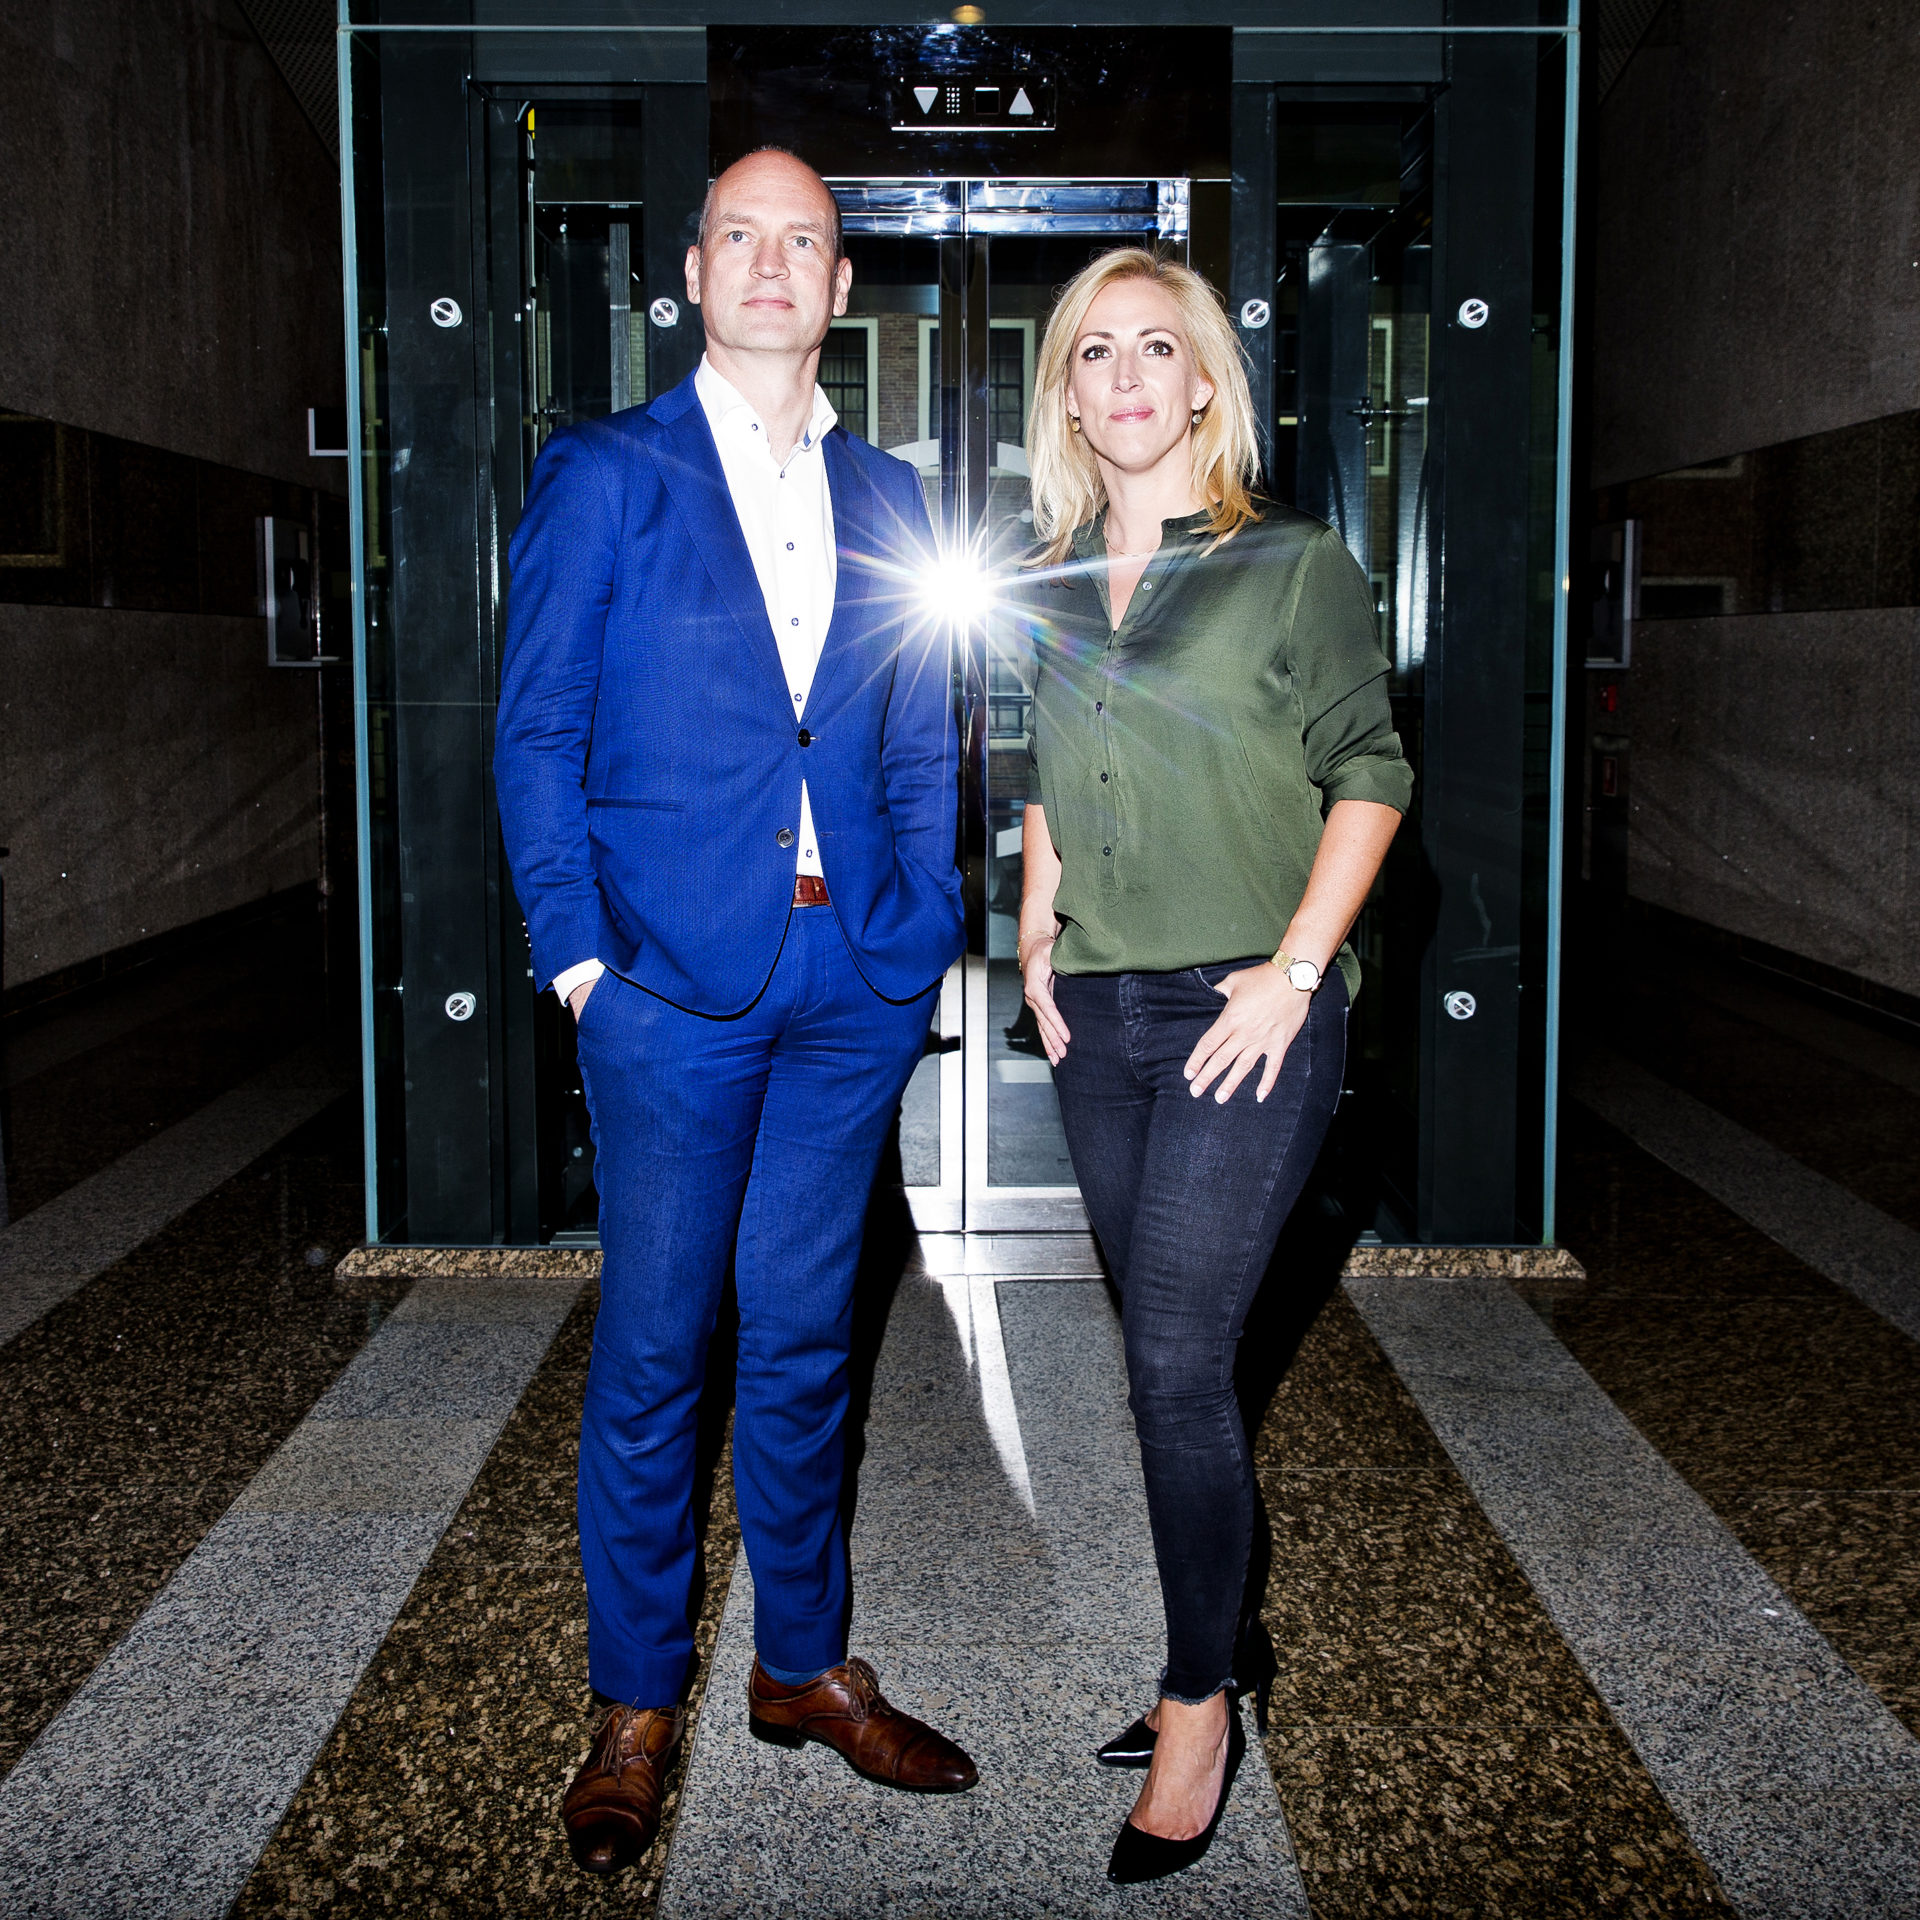 Lilian Marijnissen en Gert-Jan Segers